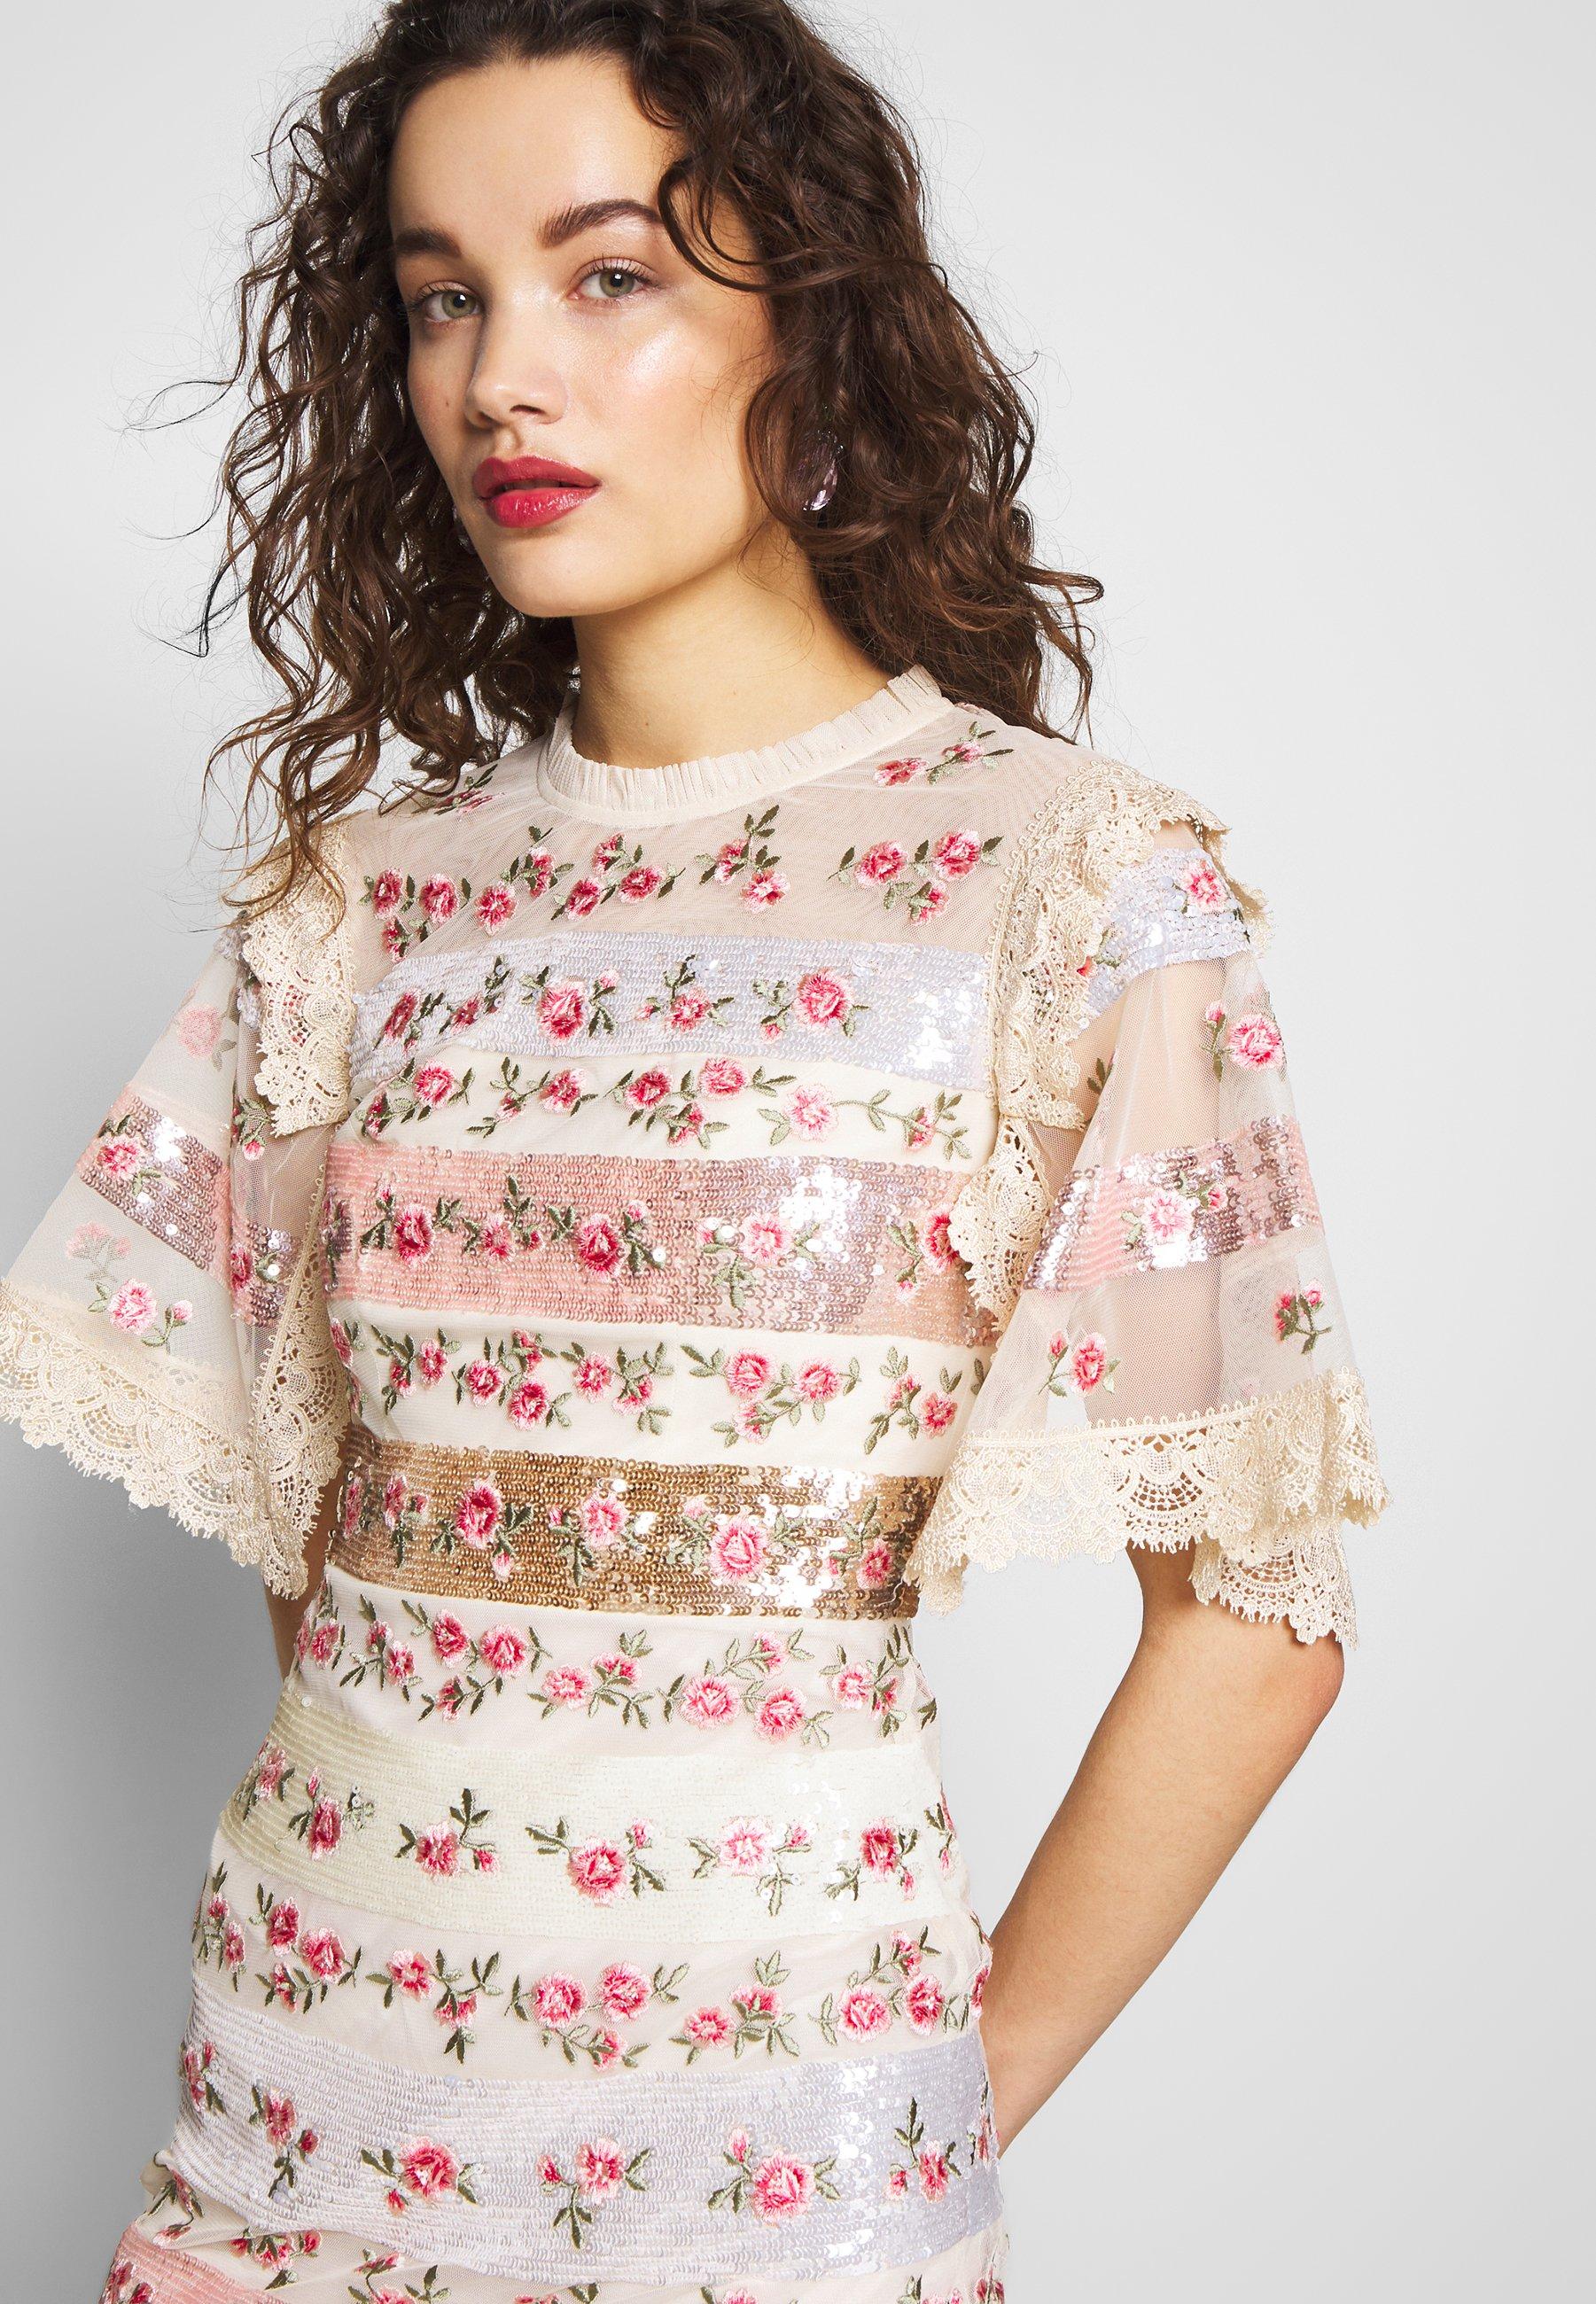 Needle & Thread Rose Bud Mini Dress - Cocktailklänning Offwhite